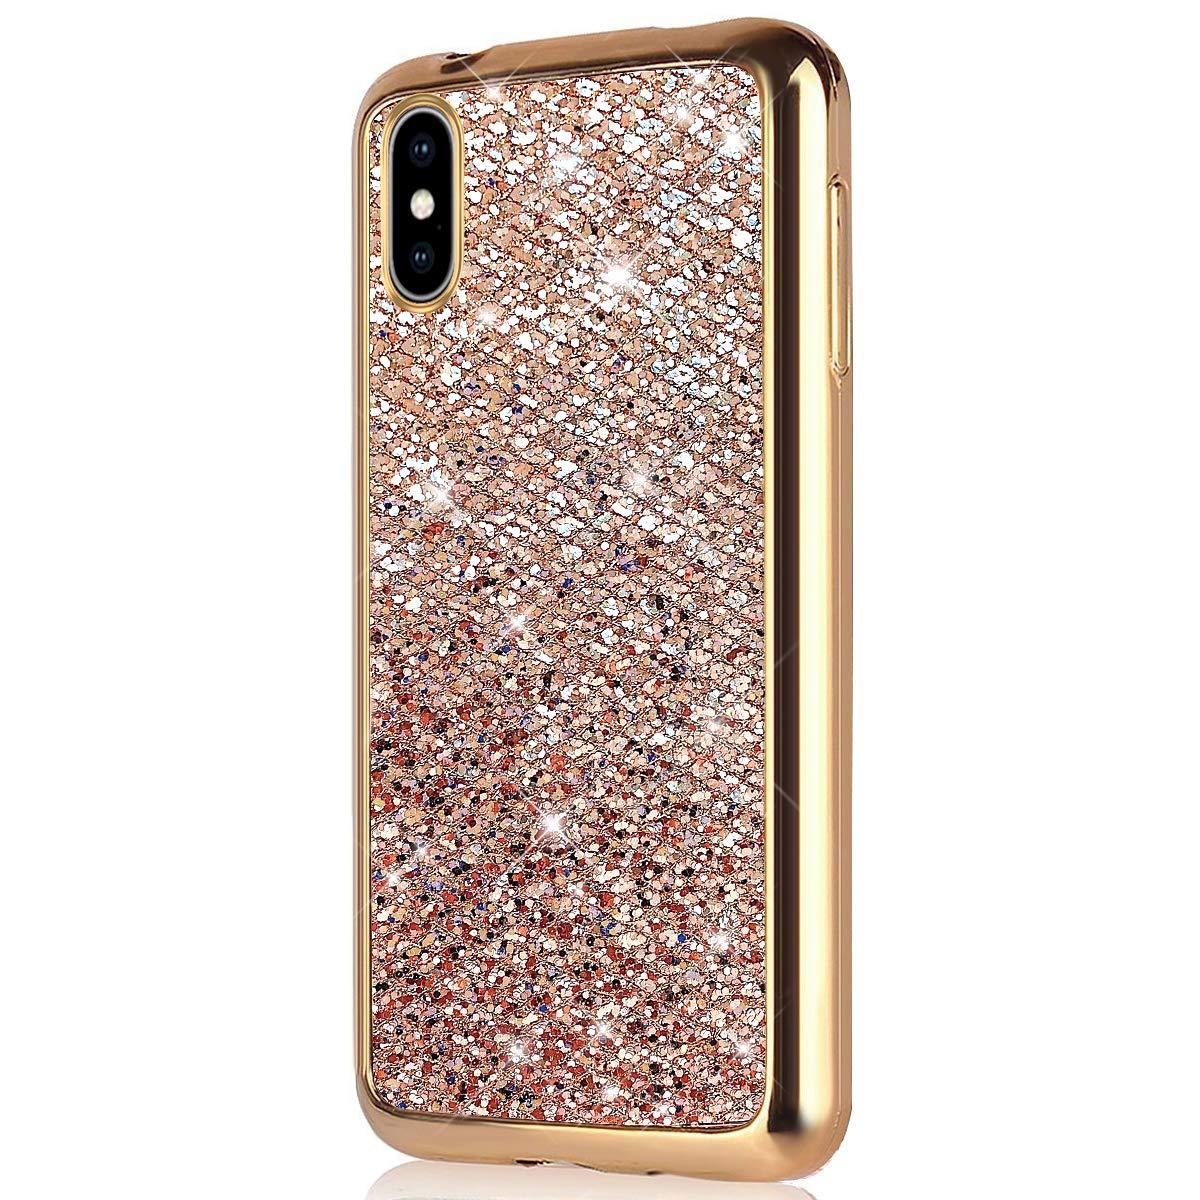 Herbests Compatible avec Coque iPhone XS Max Silicone Paillette Housse Bling Glitter Etui Ultra Mince Case Cover Ultra Fine Soft Gel TPU Caoutchouc Bumper Protection,d'or